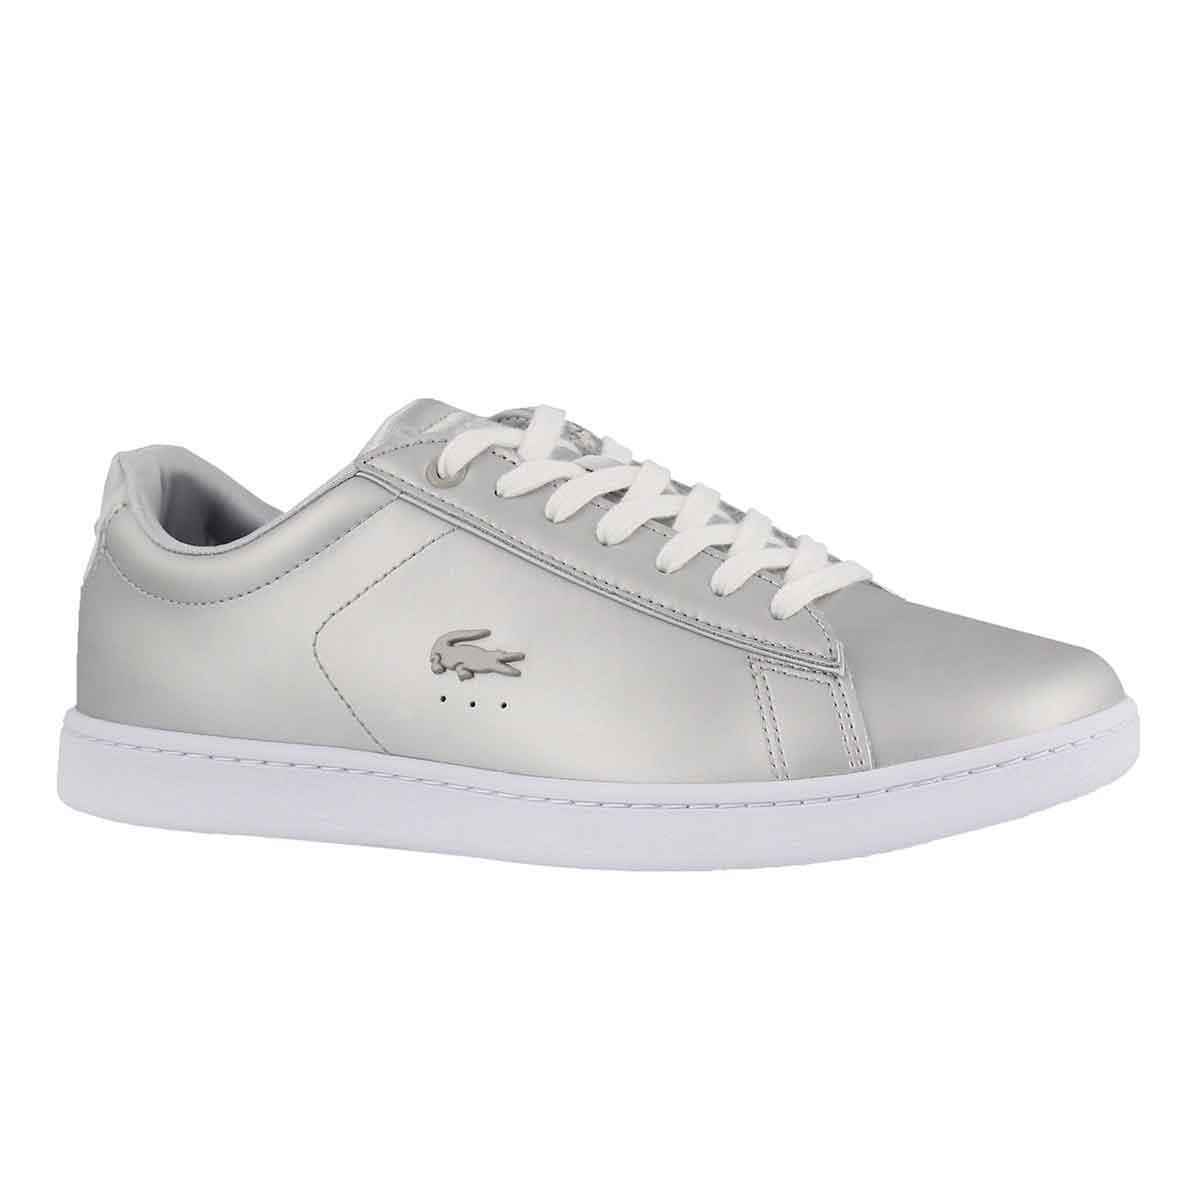 Women's CARNABY EVO 118 1 grey/white sneaker